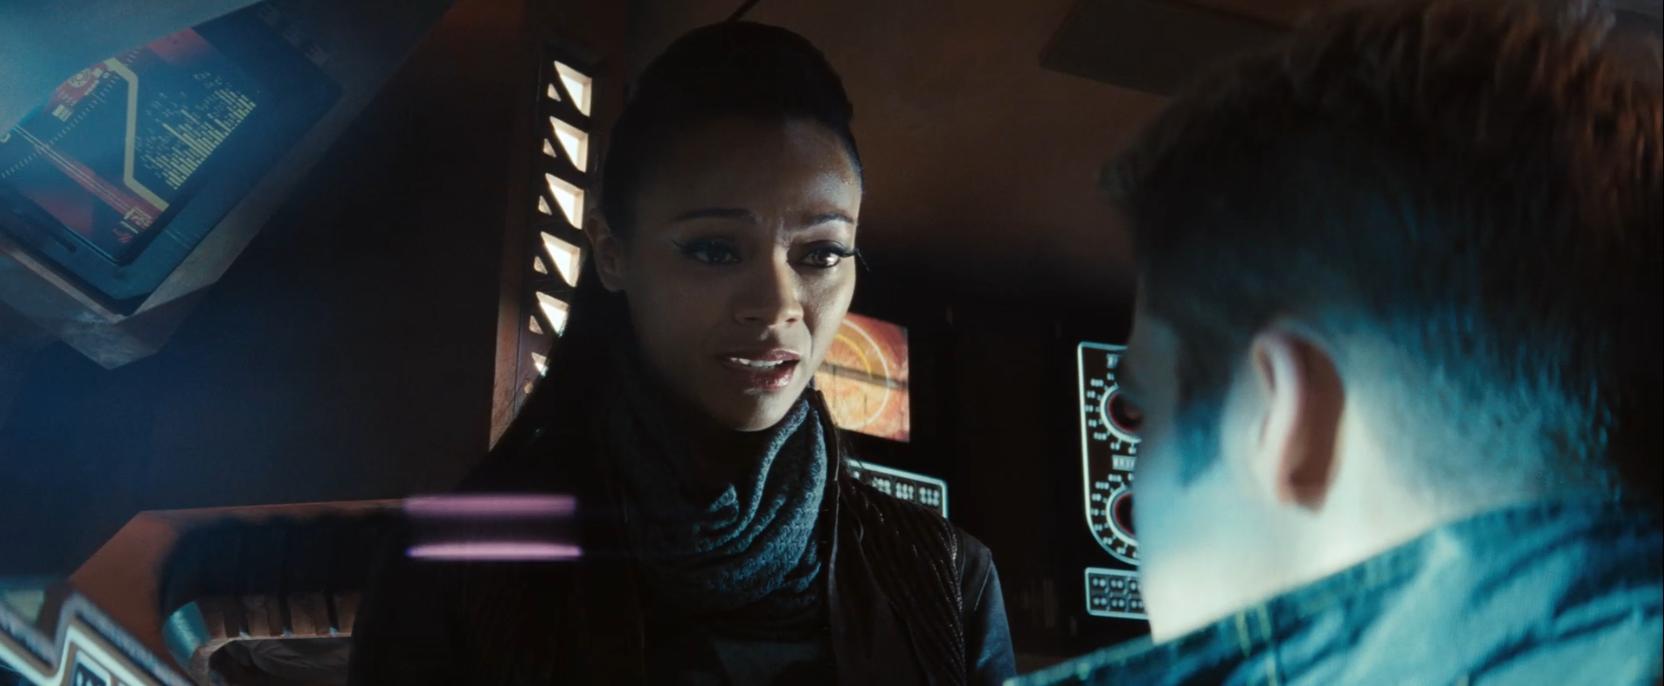 Zoe Saldana as Nyota Uhura in Star Trek Into Darkness